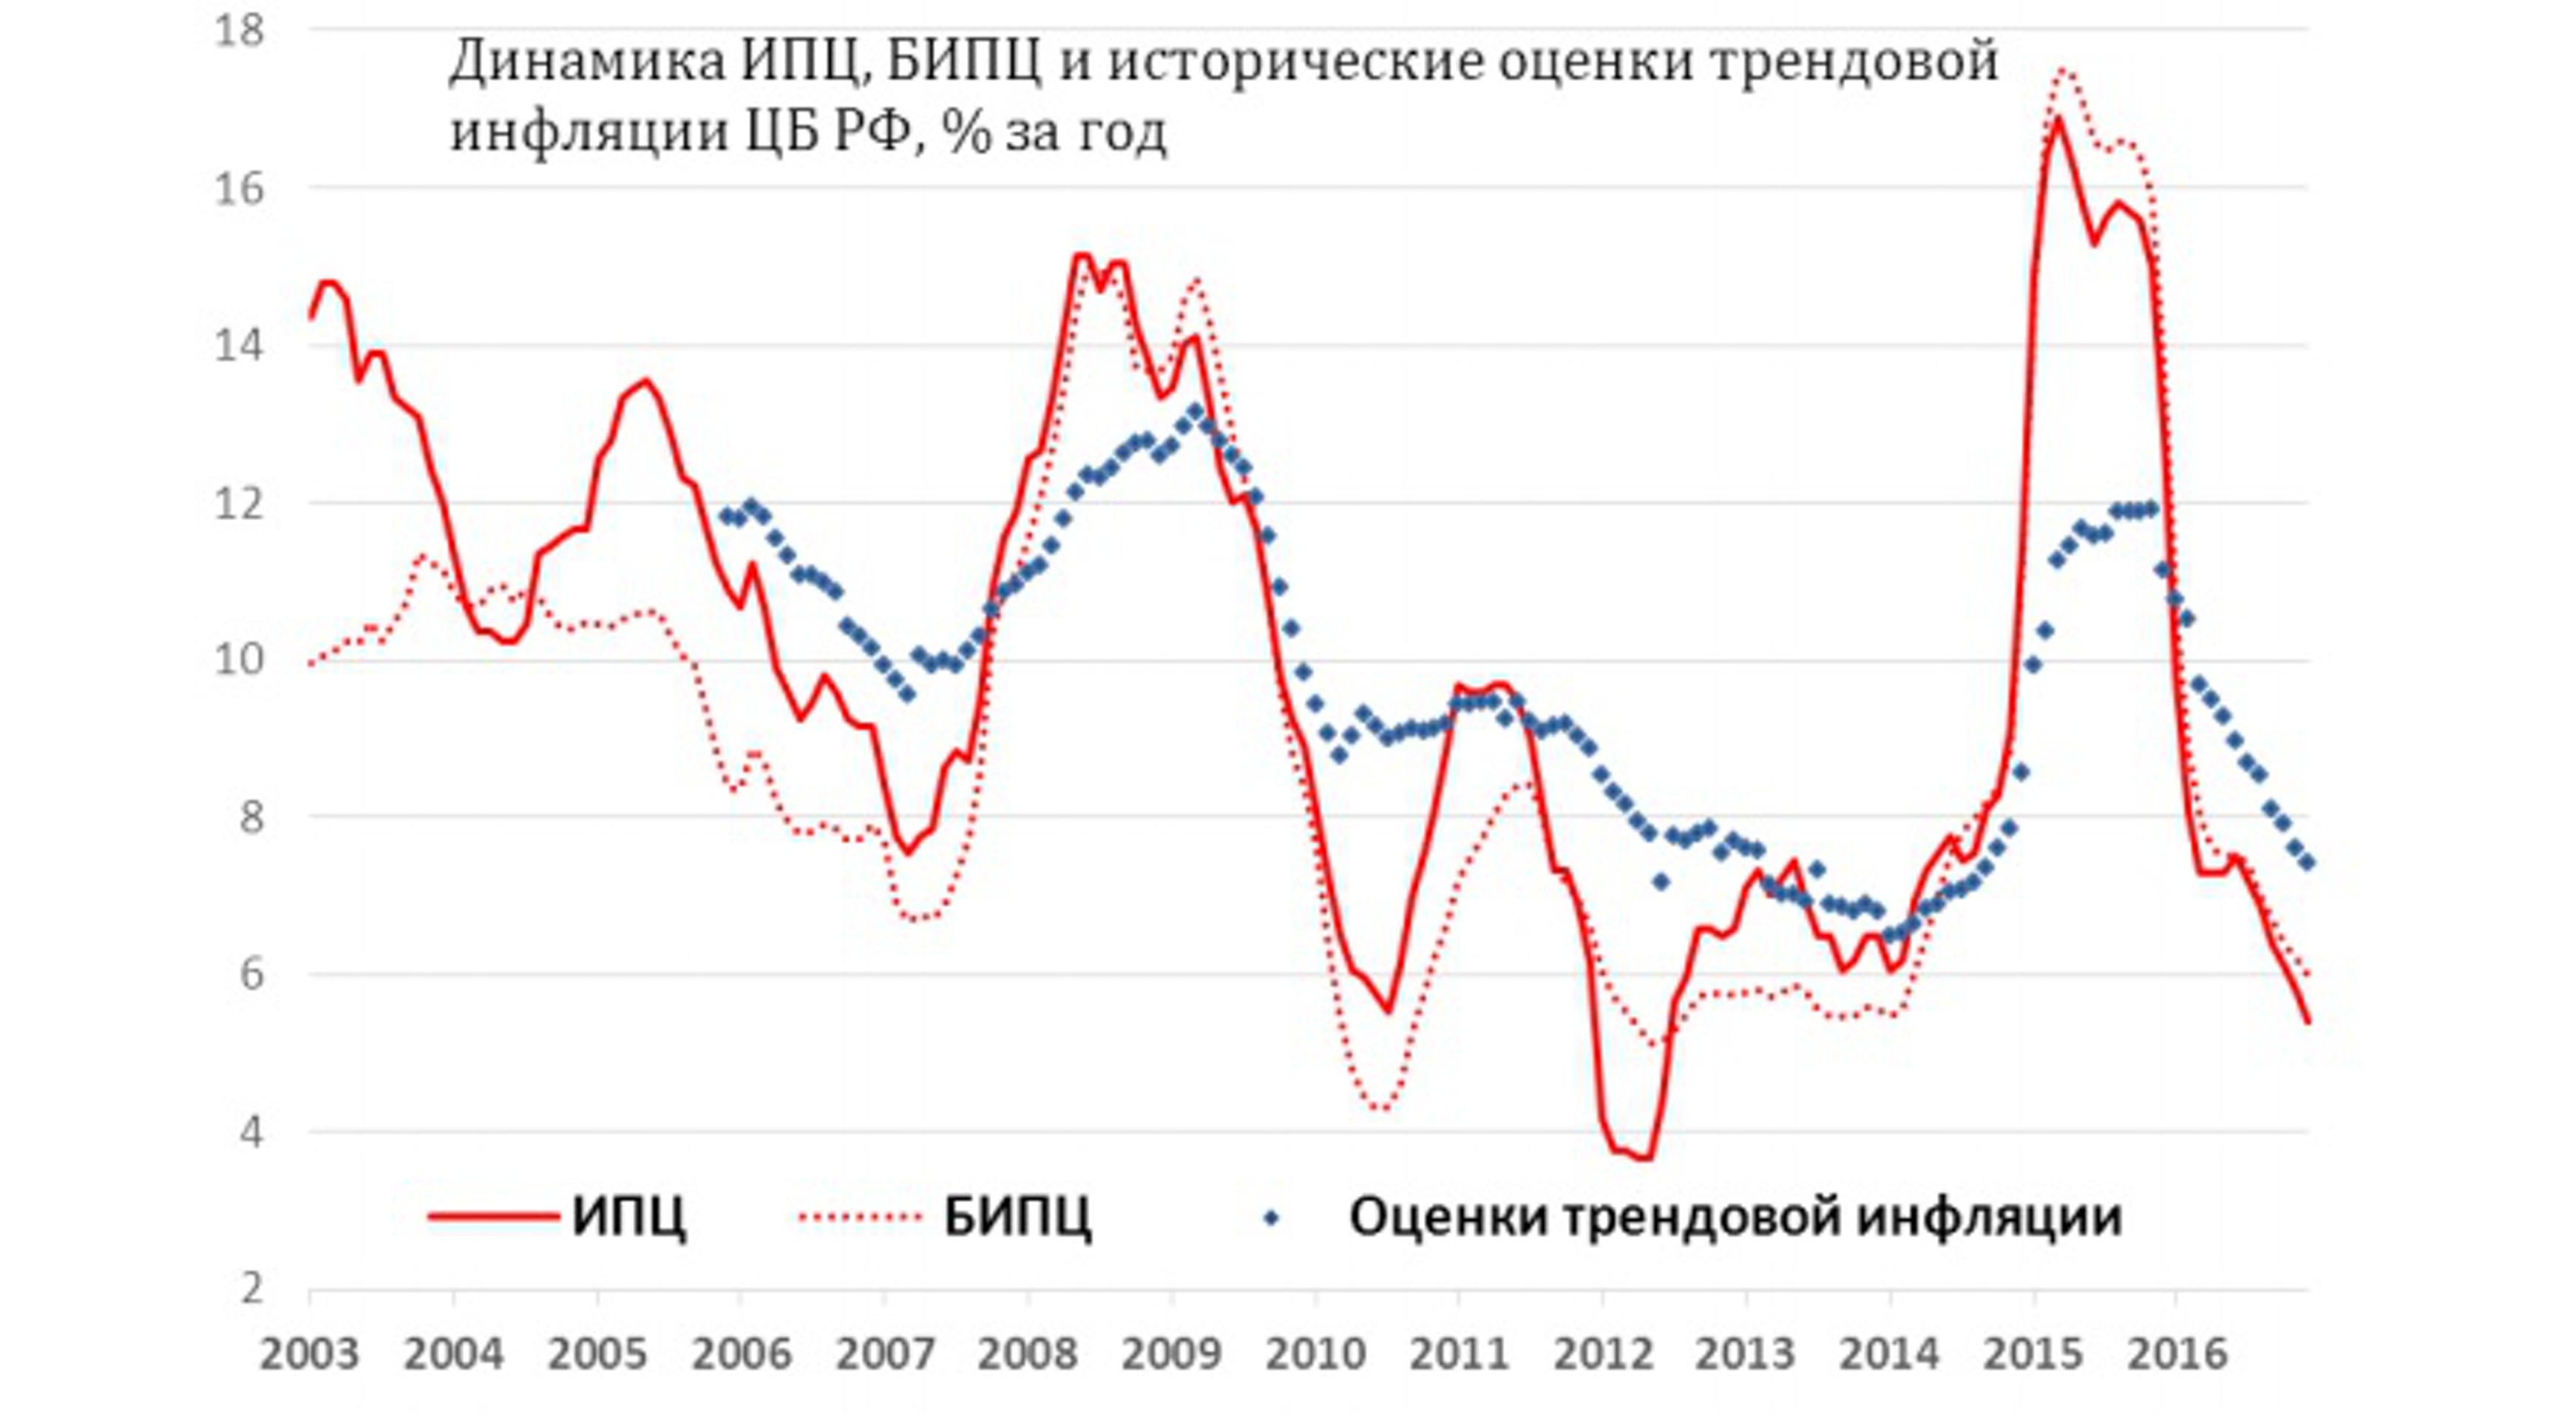 ЦБ: трендовая инфляция замедлилась